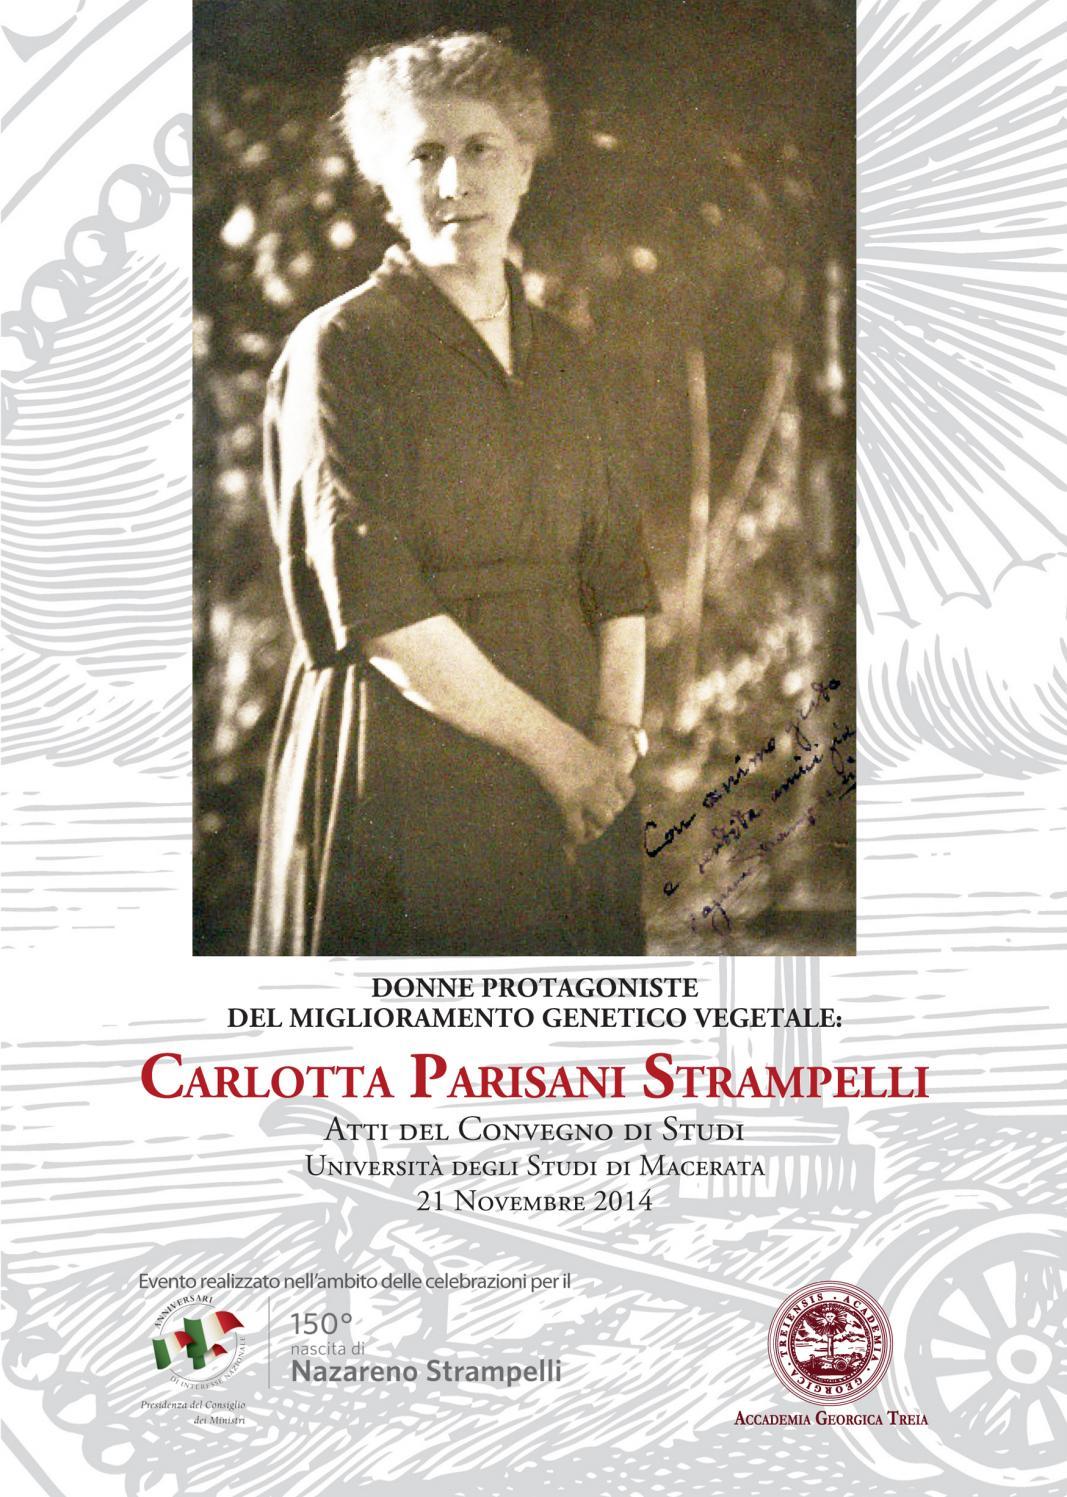 Donne protagoniste del miglioramento genetico vegetale  Carlotta Parisani  Strampelli by Accademia Georgica - issuu 4b21cbc5b63b